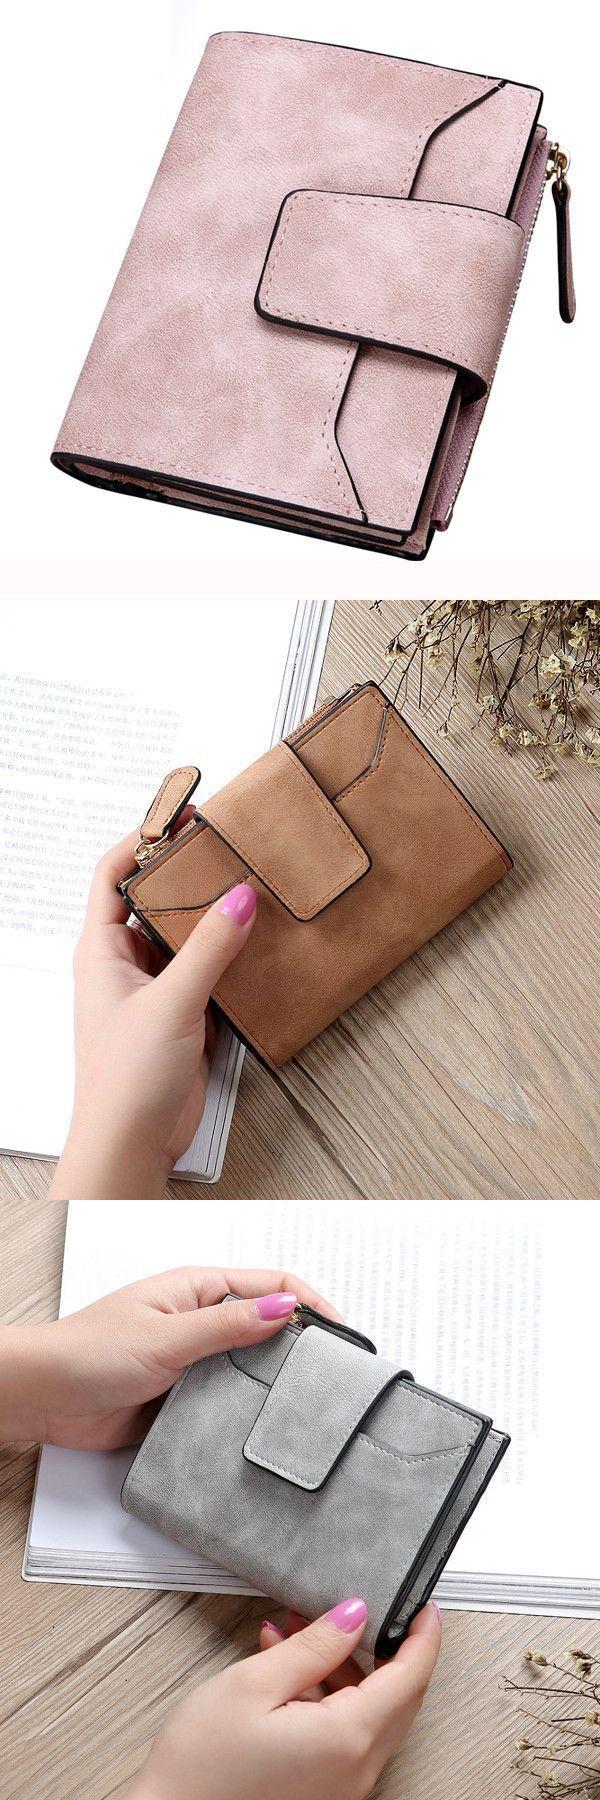 Women Matte Hasp Short Wallets S Two Fold Purse Card Holder Coin Bags Macy 8217